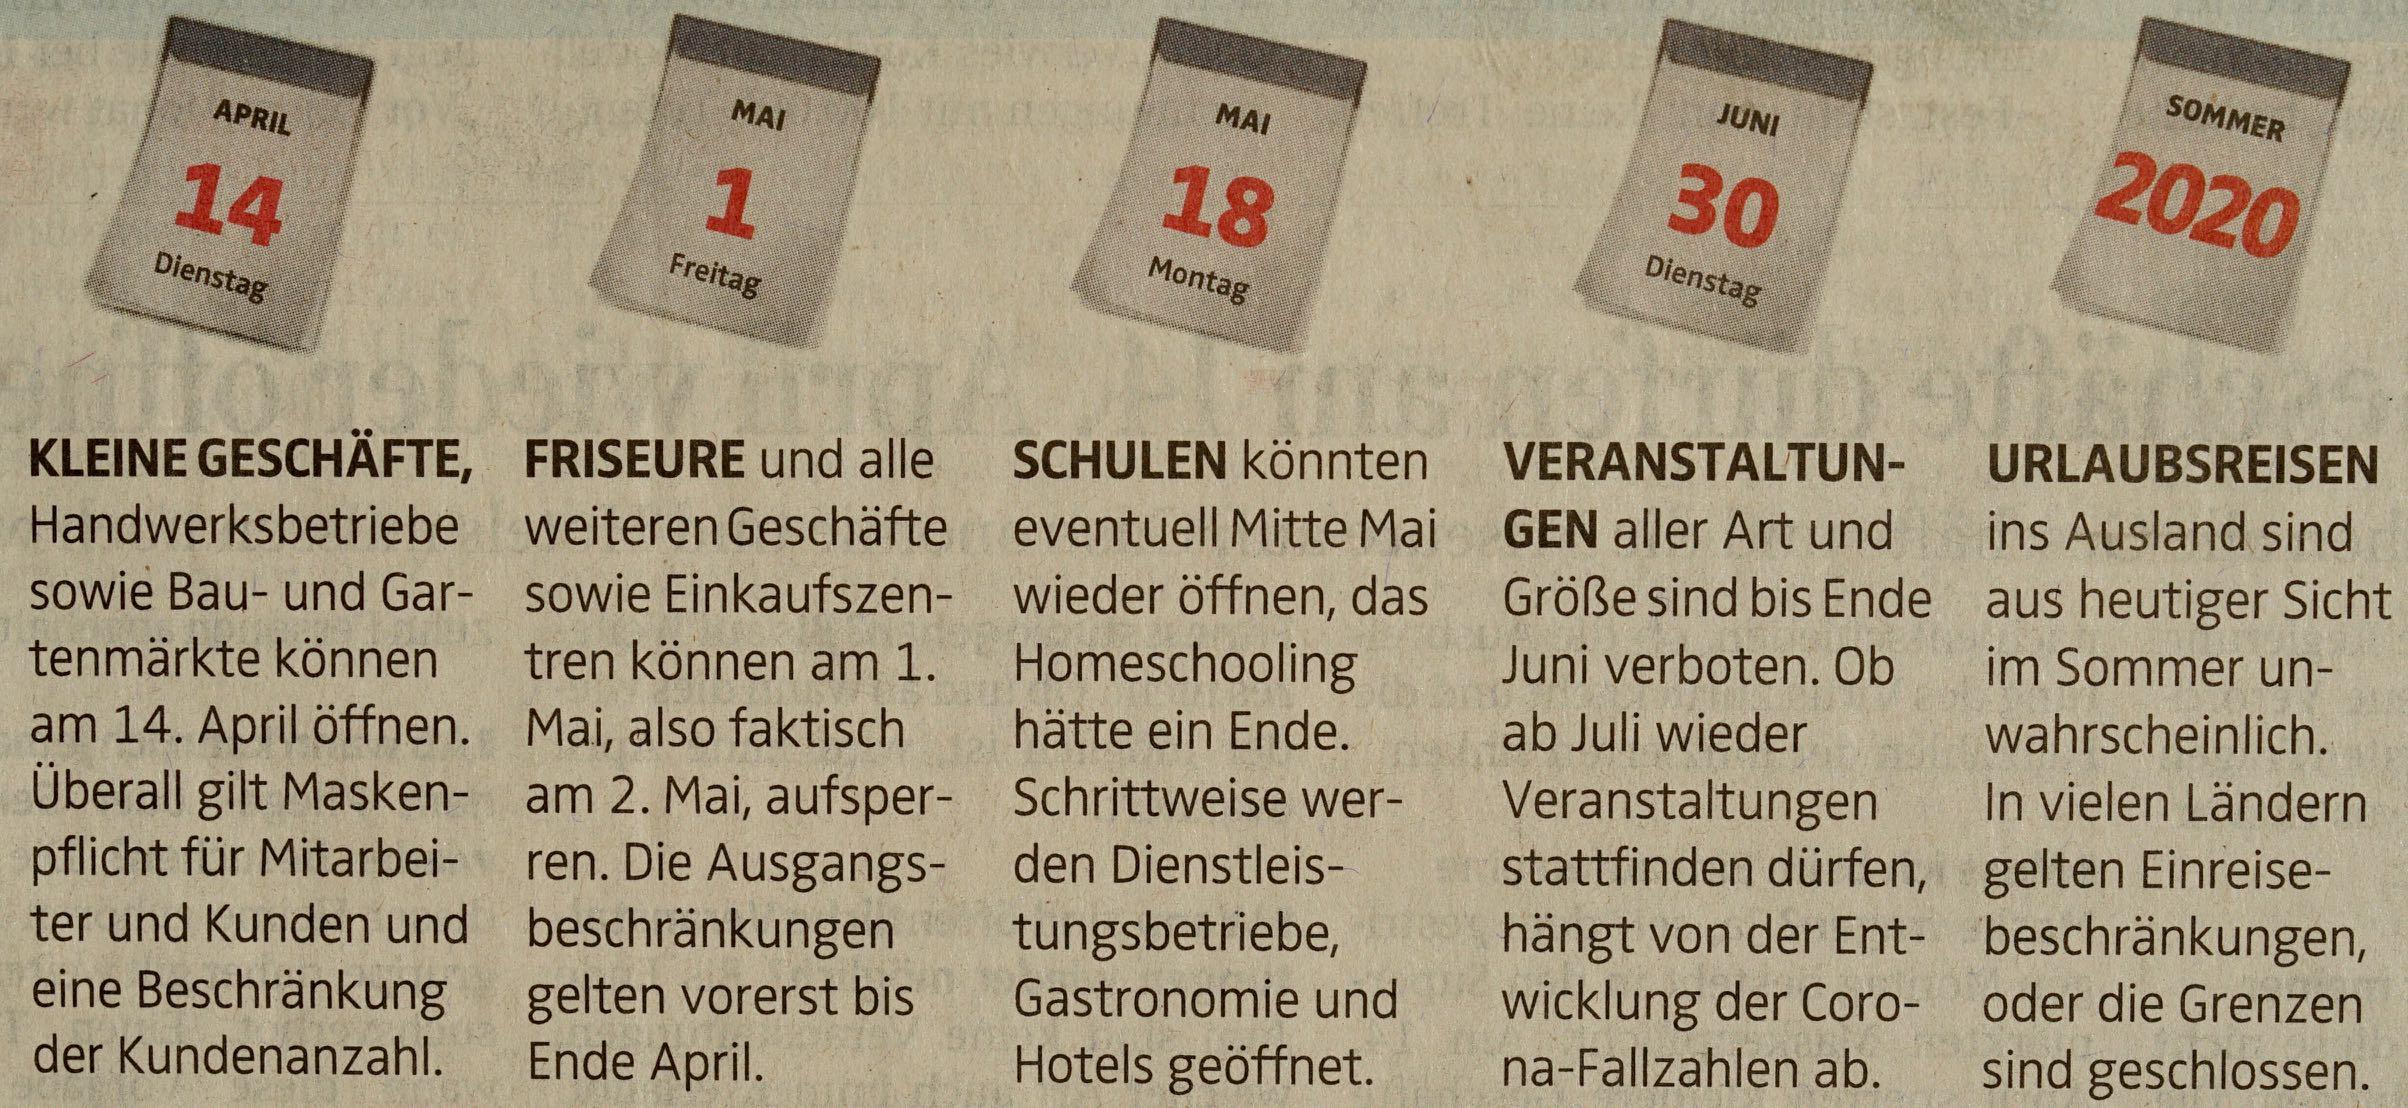 Zeitungsbericht 7. April 2020